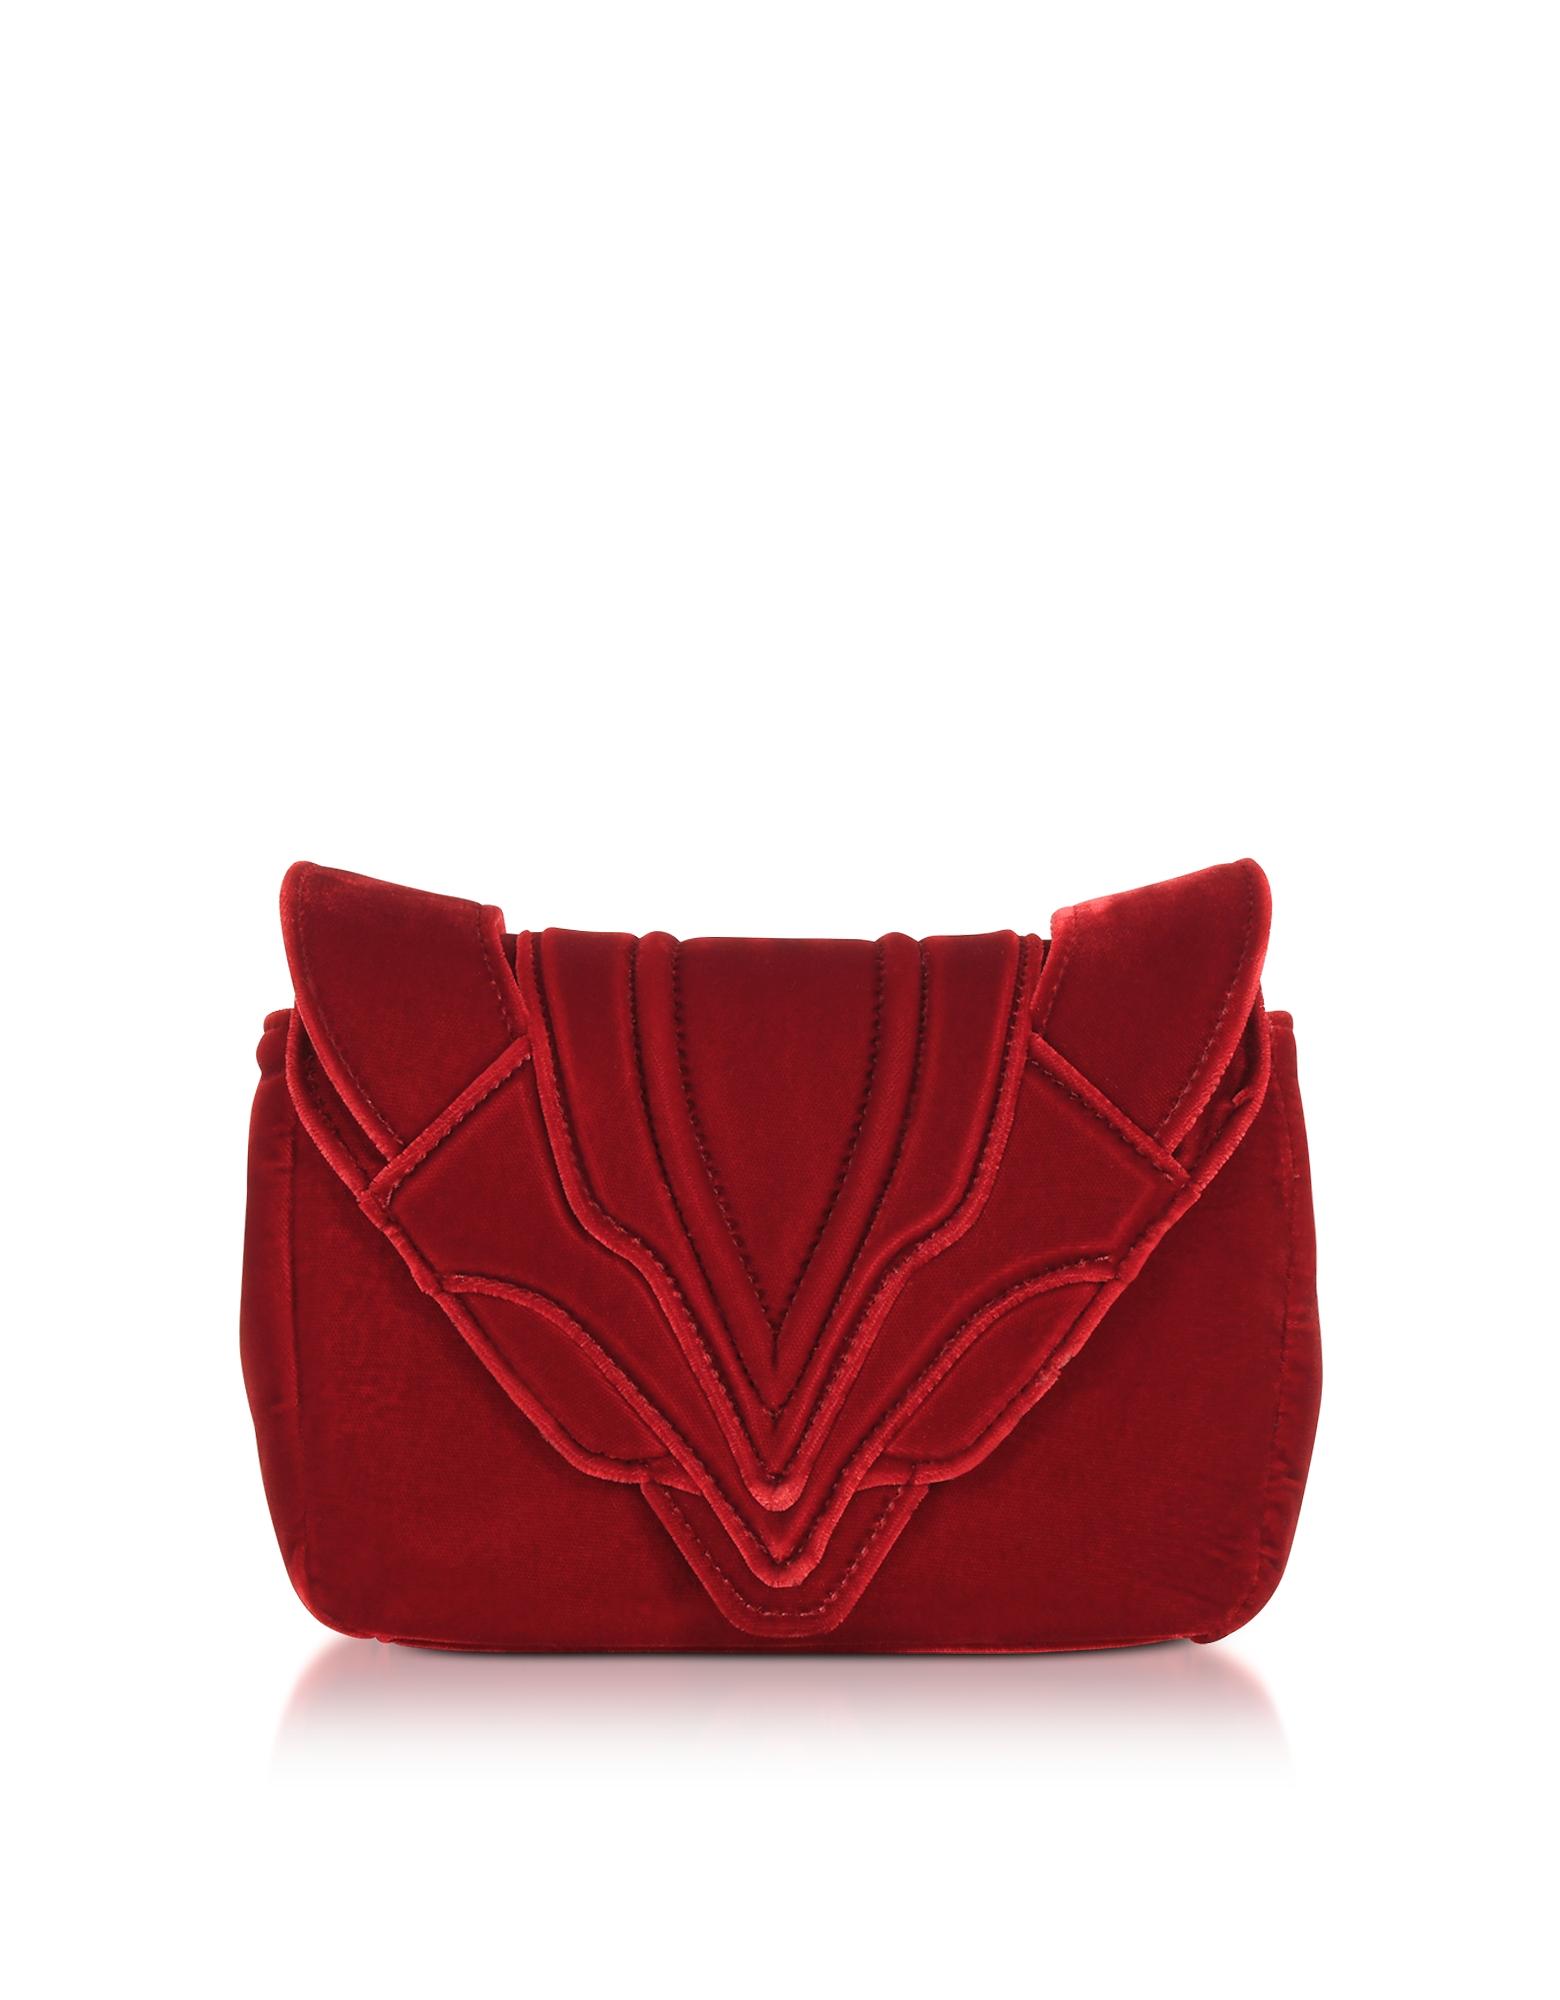 Elena Ghisellini Handbags, Ribes Velvet Felix Clutch